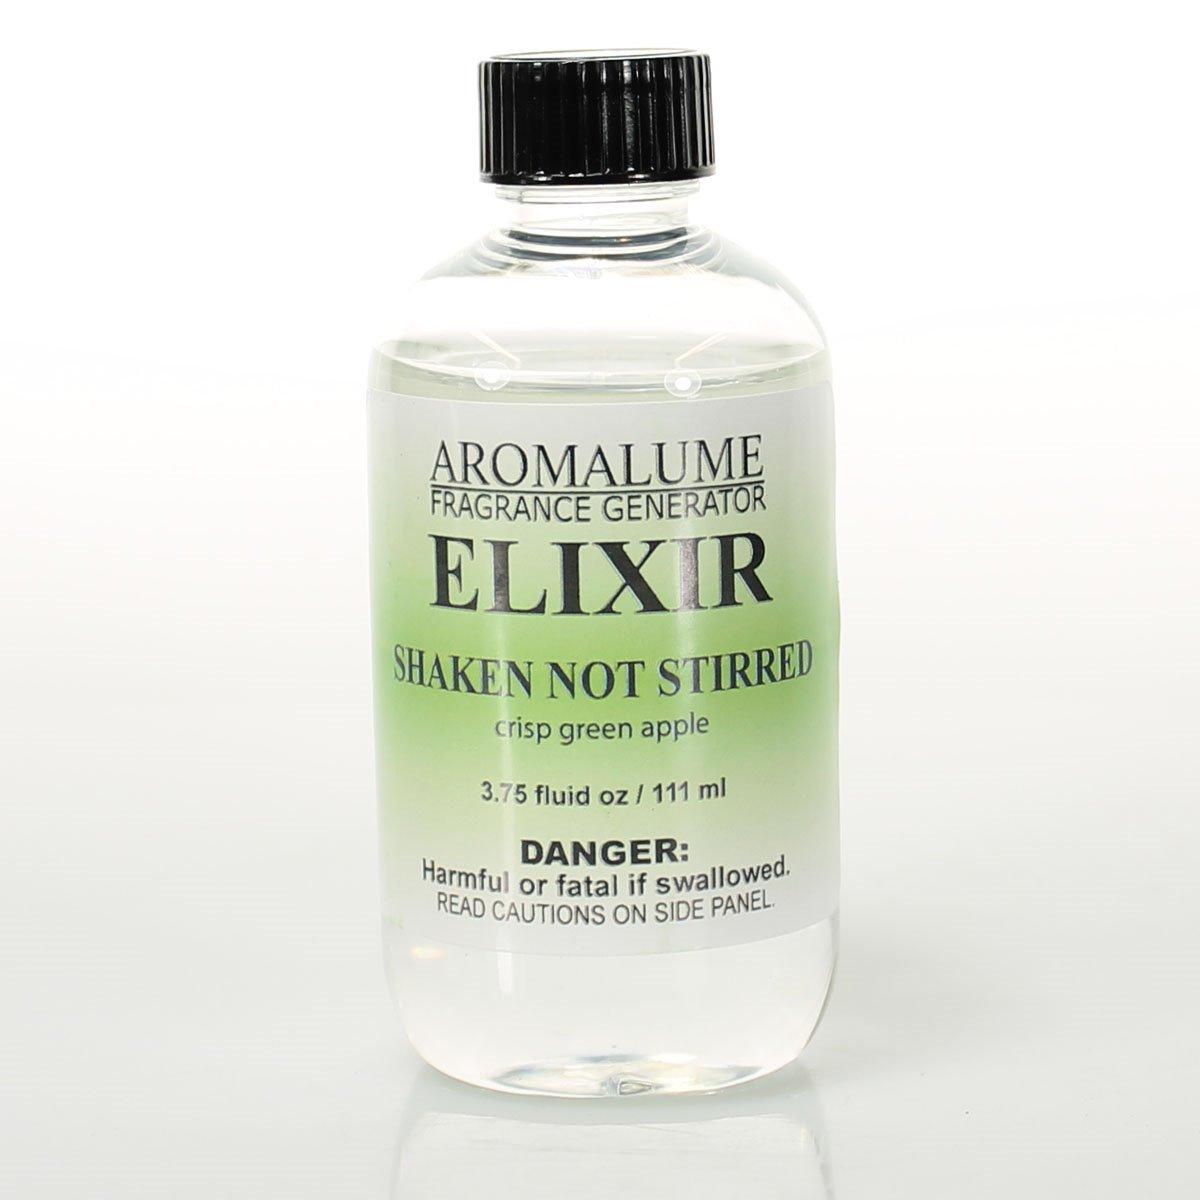 La Tee Da AromaLume Refill Elixir Fragrance Shaken Not Stirred